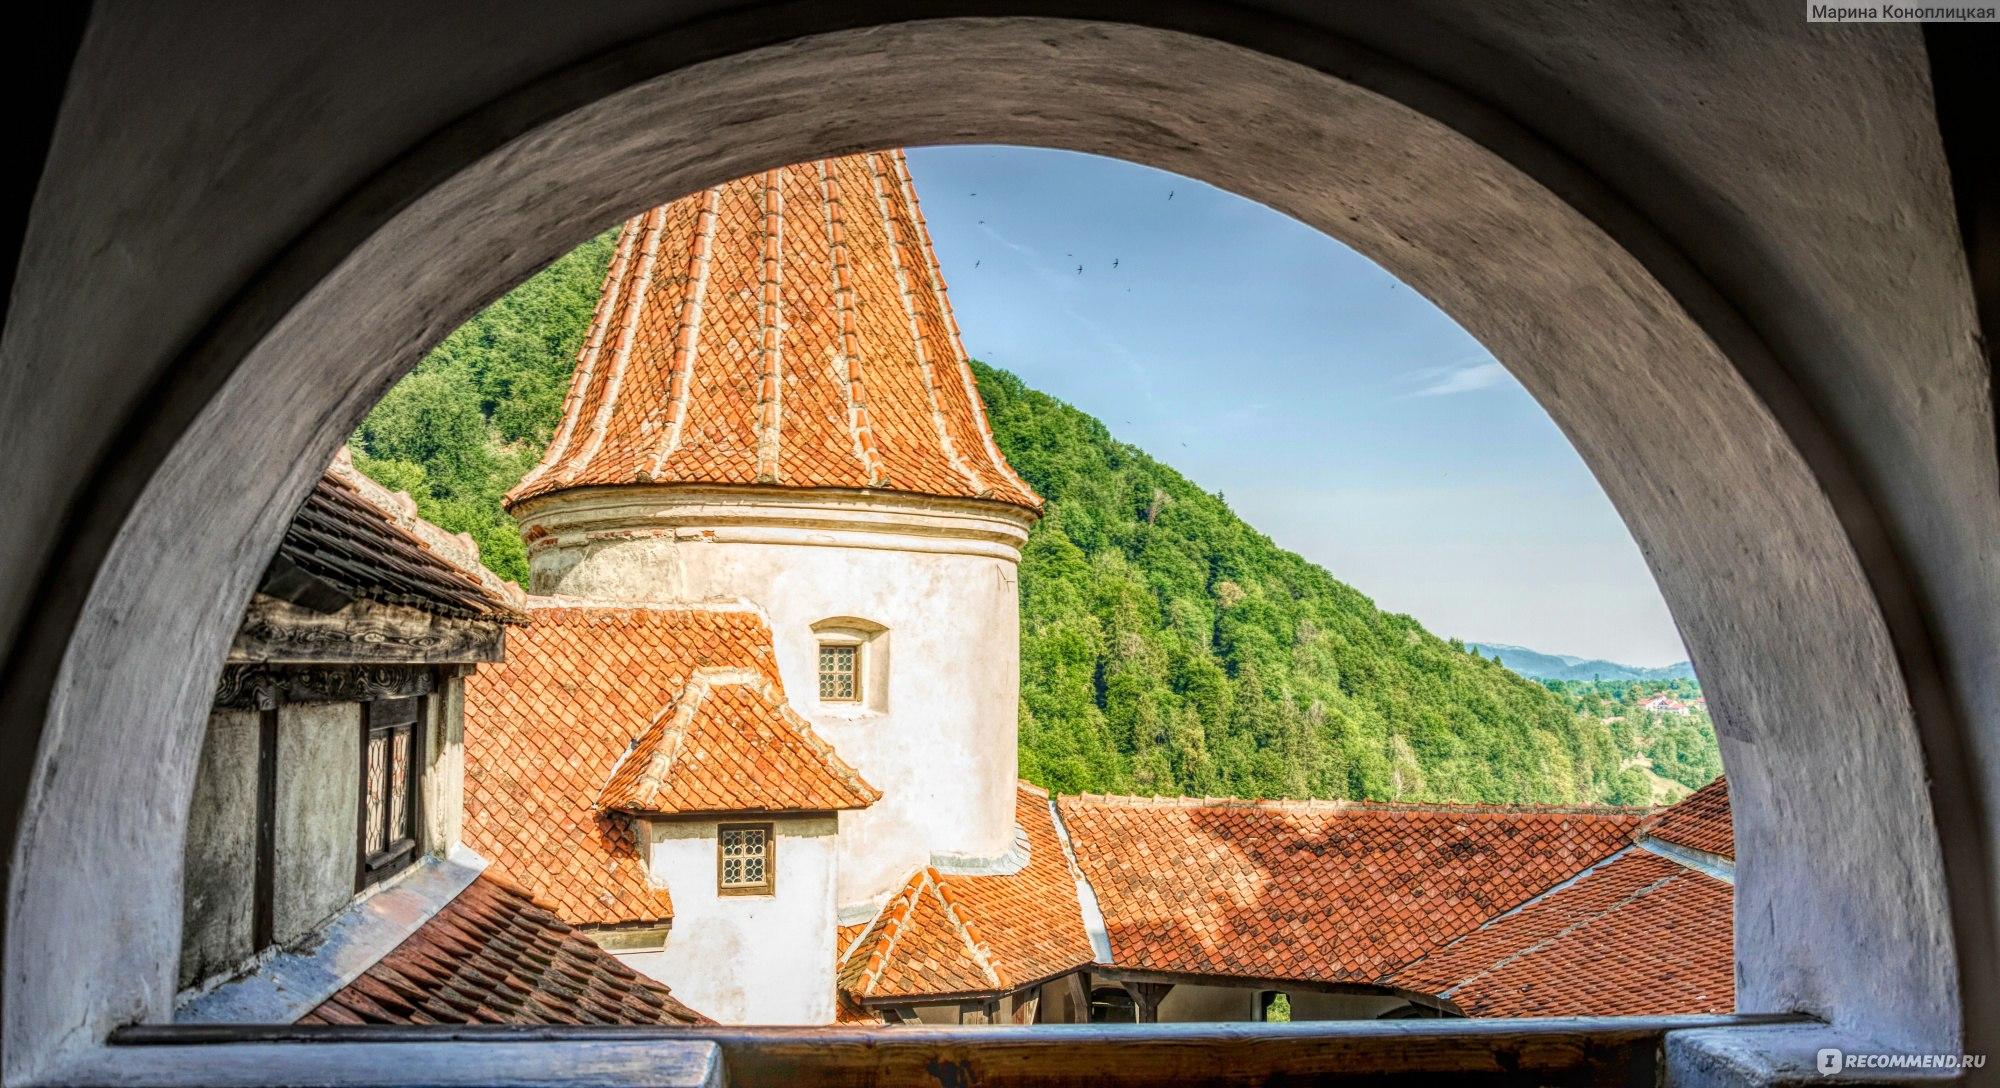 Я влюбился в Карпаты (путешествие в Румынию) XpyJ2UPk5oqXKQHkBQBvQ